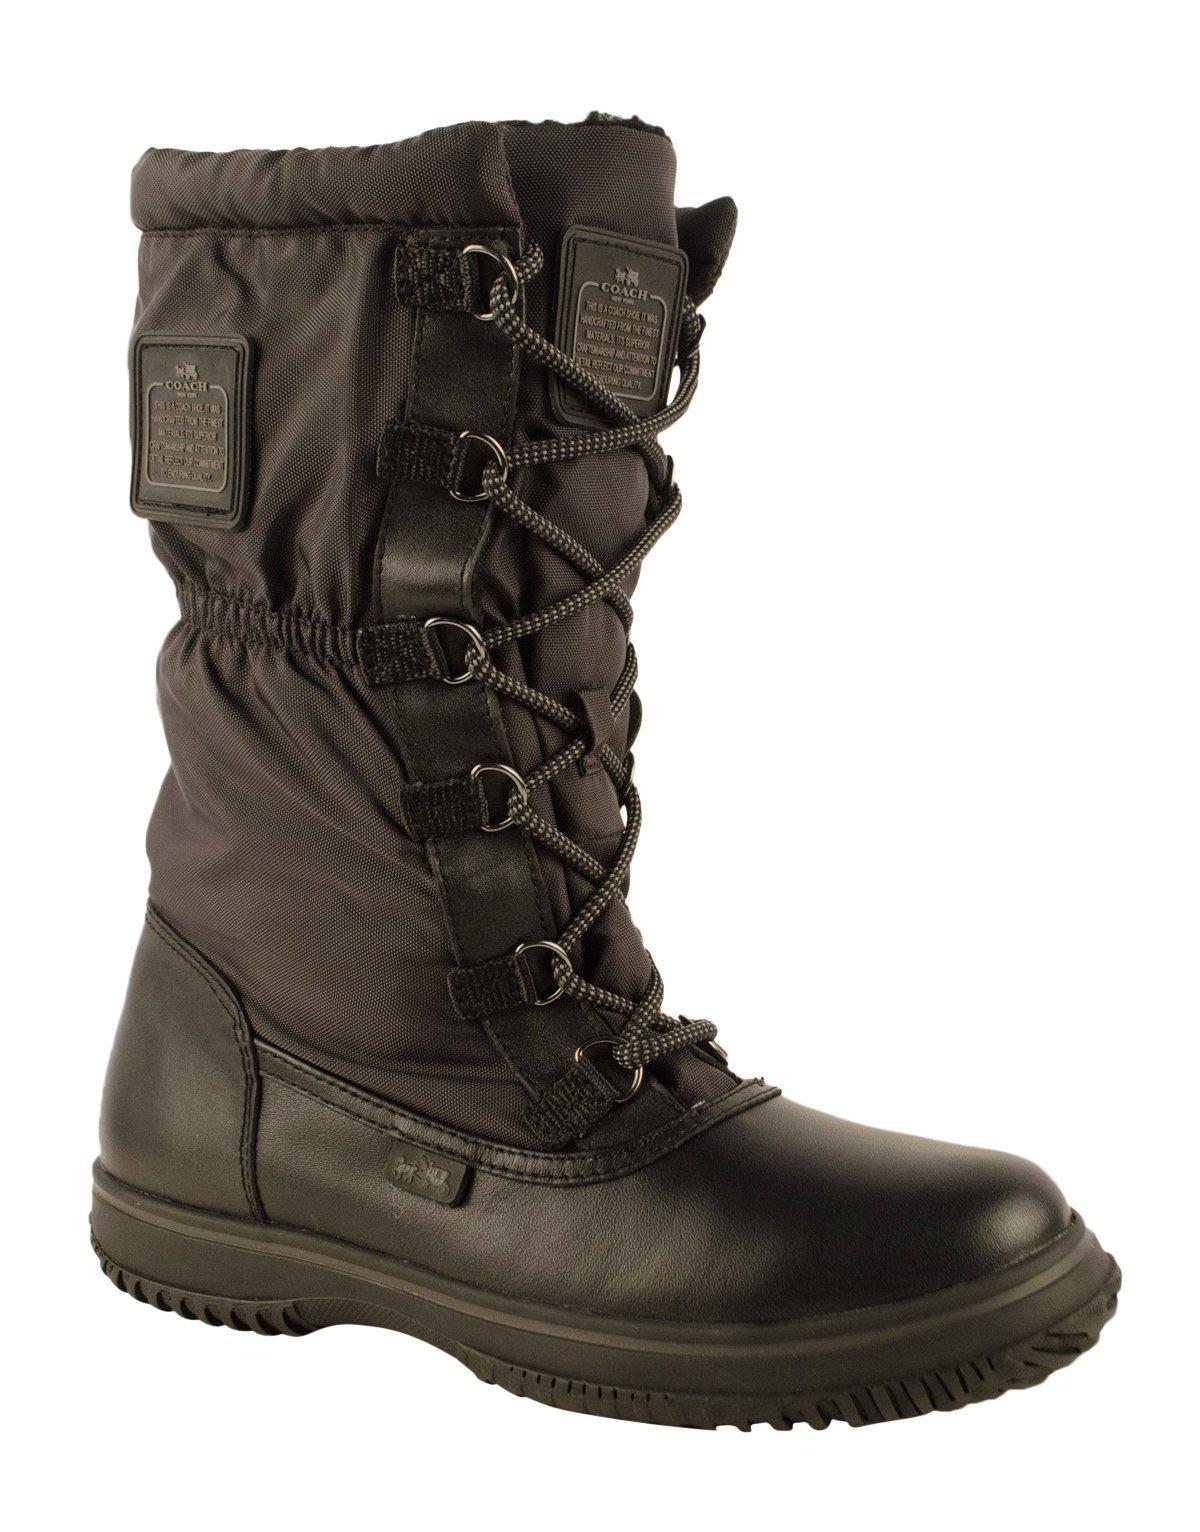 Coach Women¡¯s Sage Black/Black Lace-Up Cold Weather Boots 7 (B) M, Style A9177